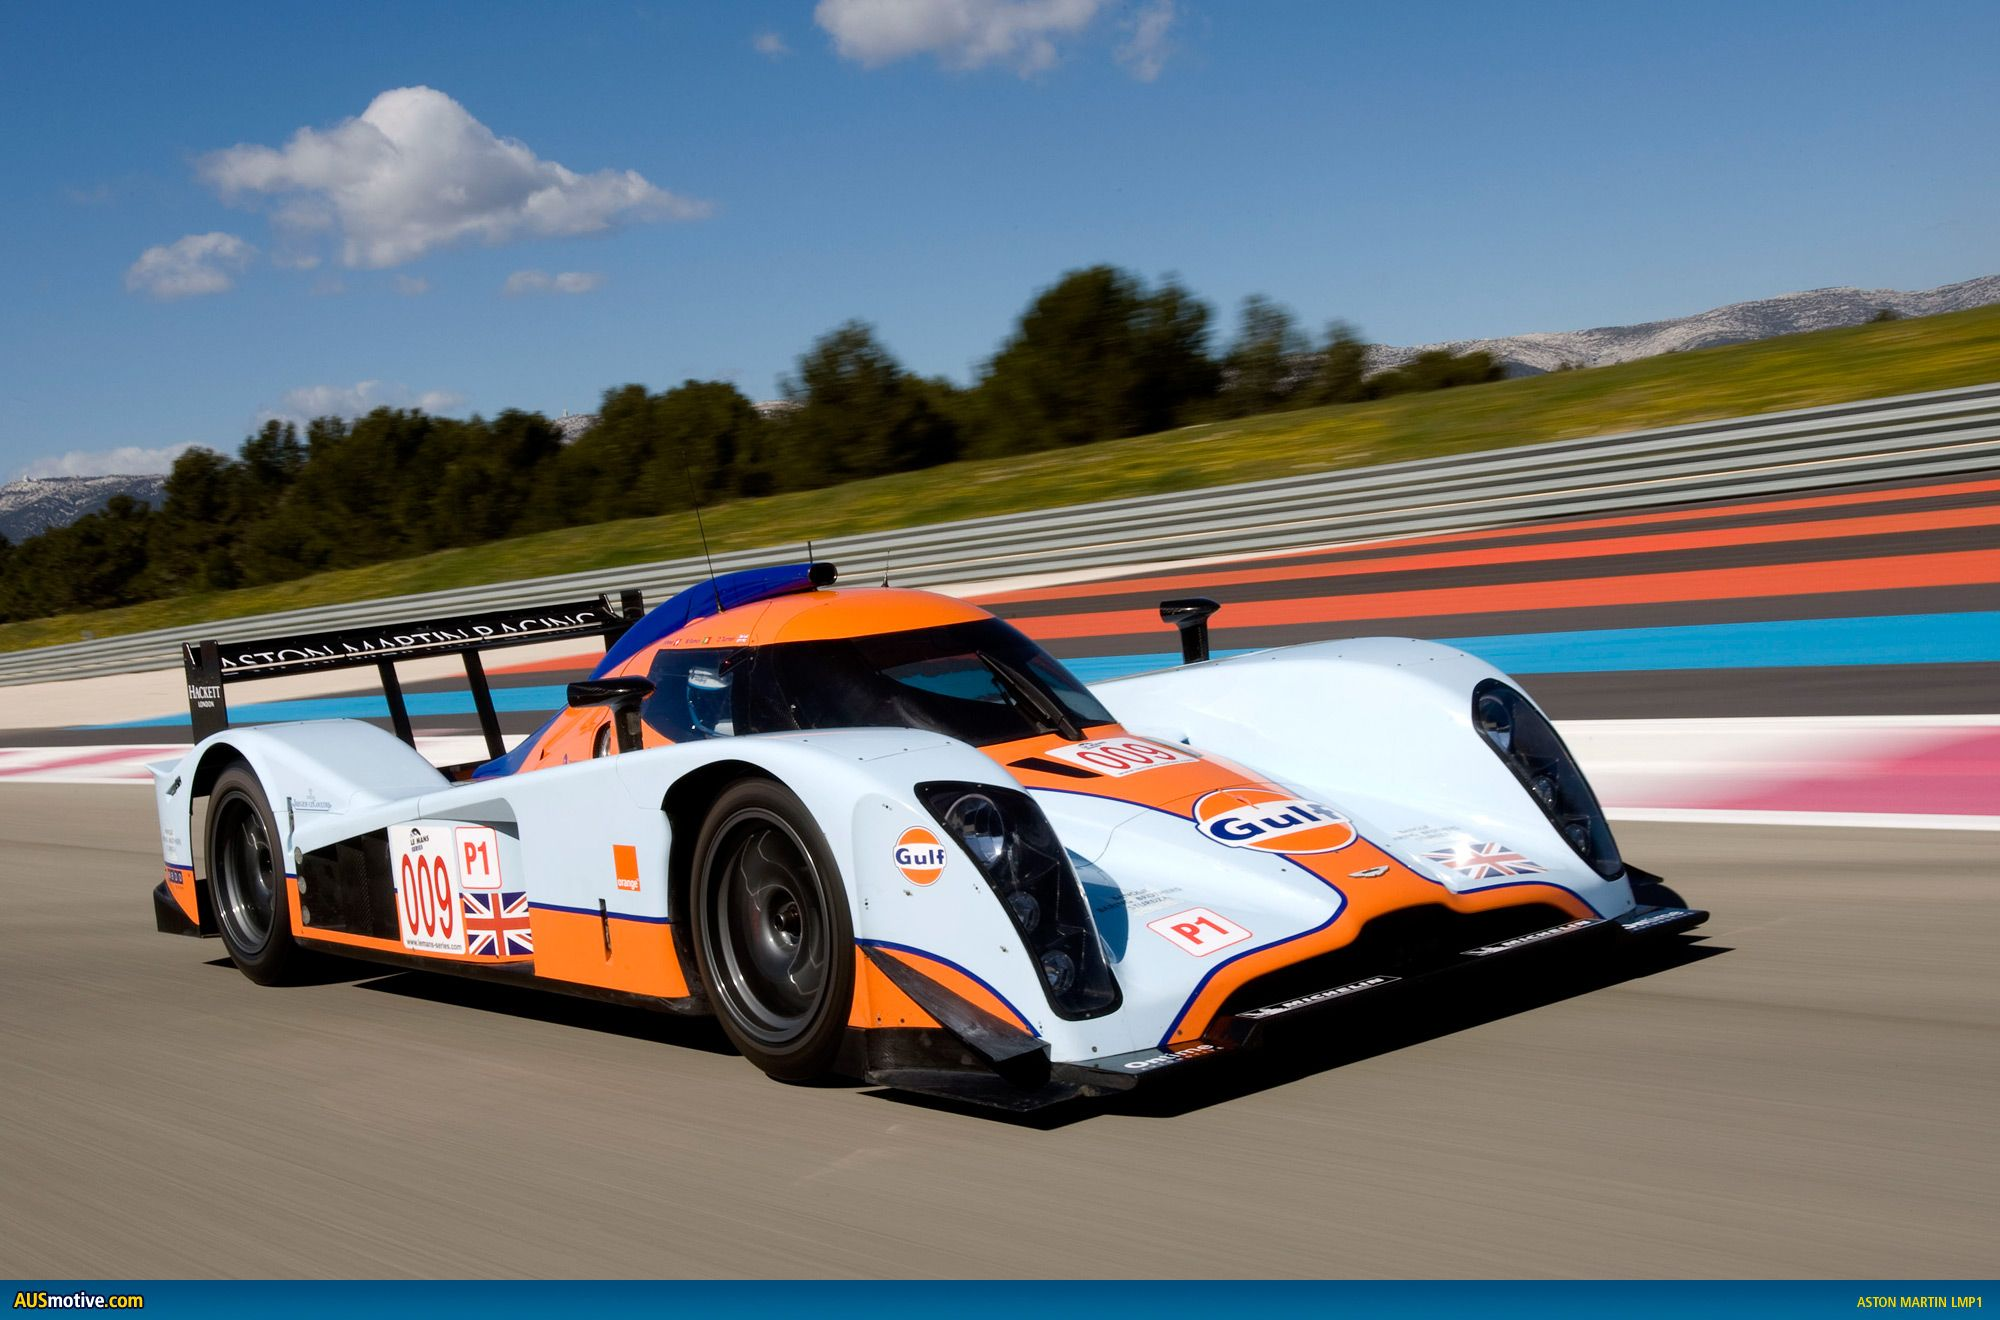 8 Aston Martin Lmp1 Ideas Aston Martin Aston Le Mans